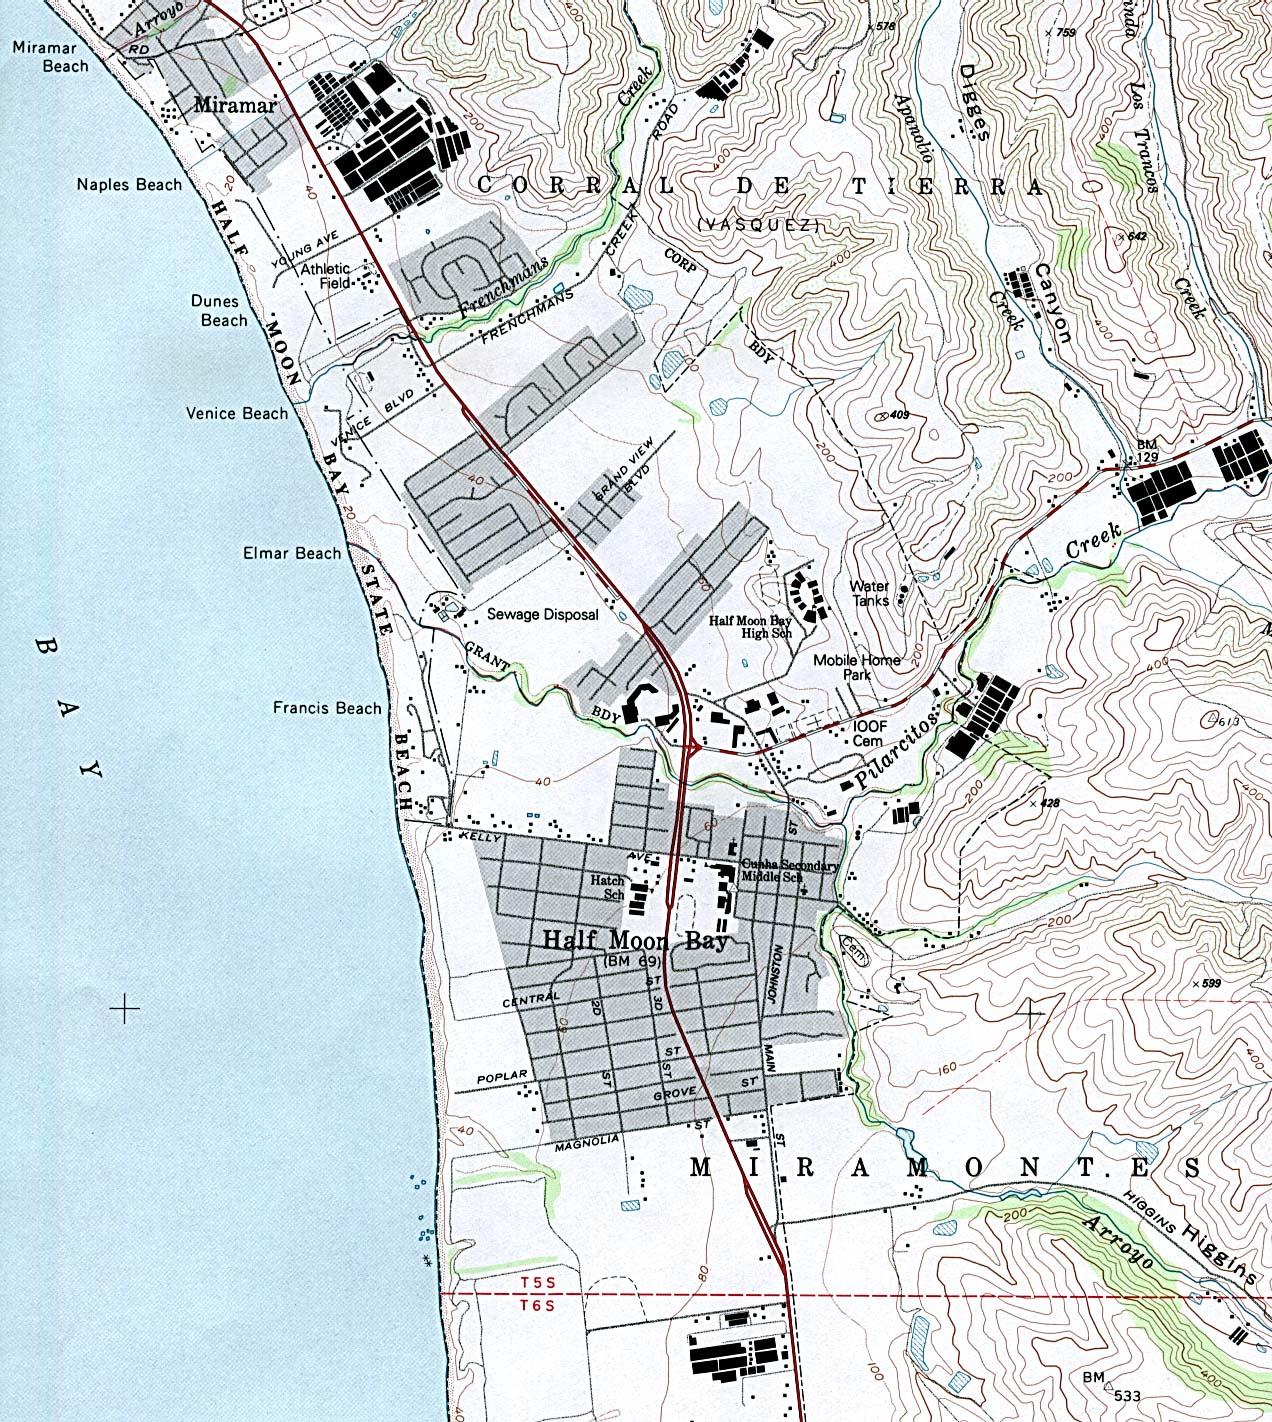 Half Moon Bay Topographic City Map, California, United States